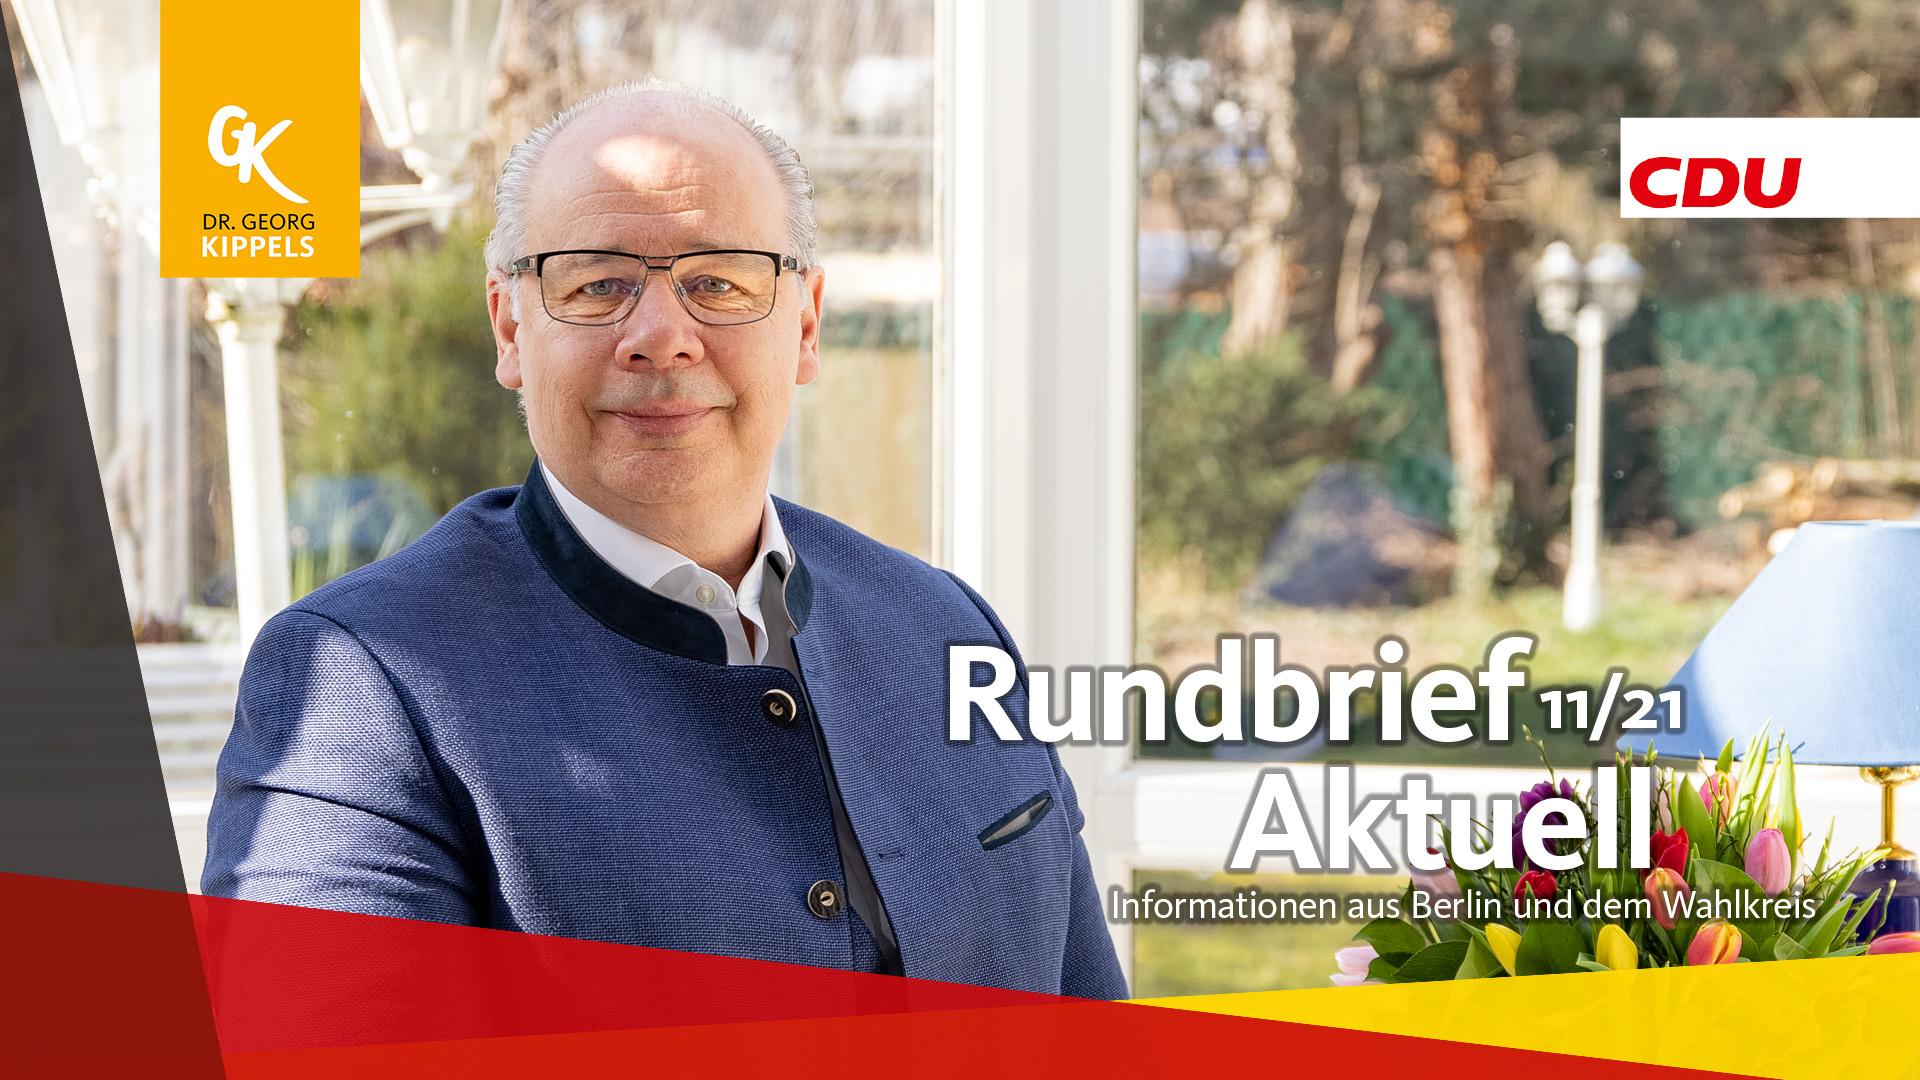 21kw11_HEAD-Rundbrief